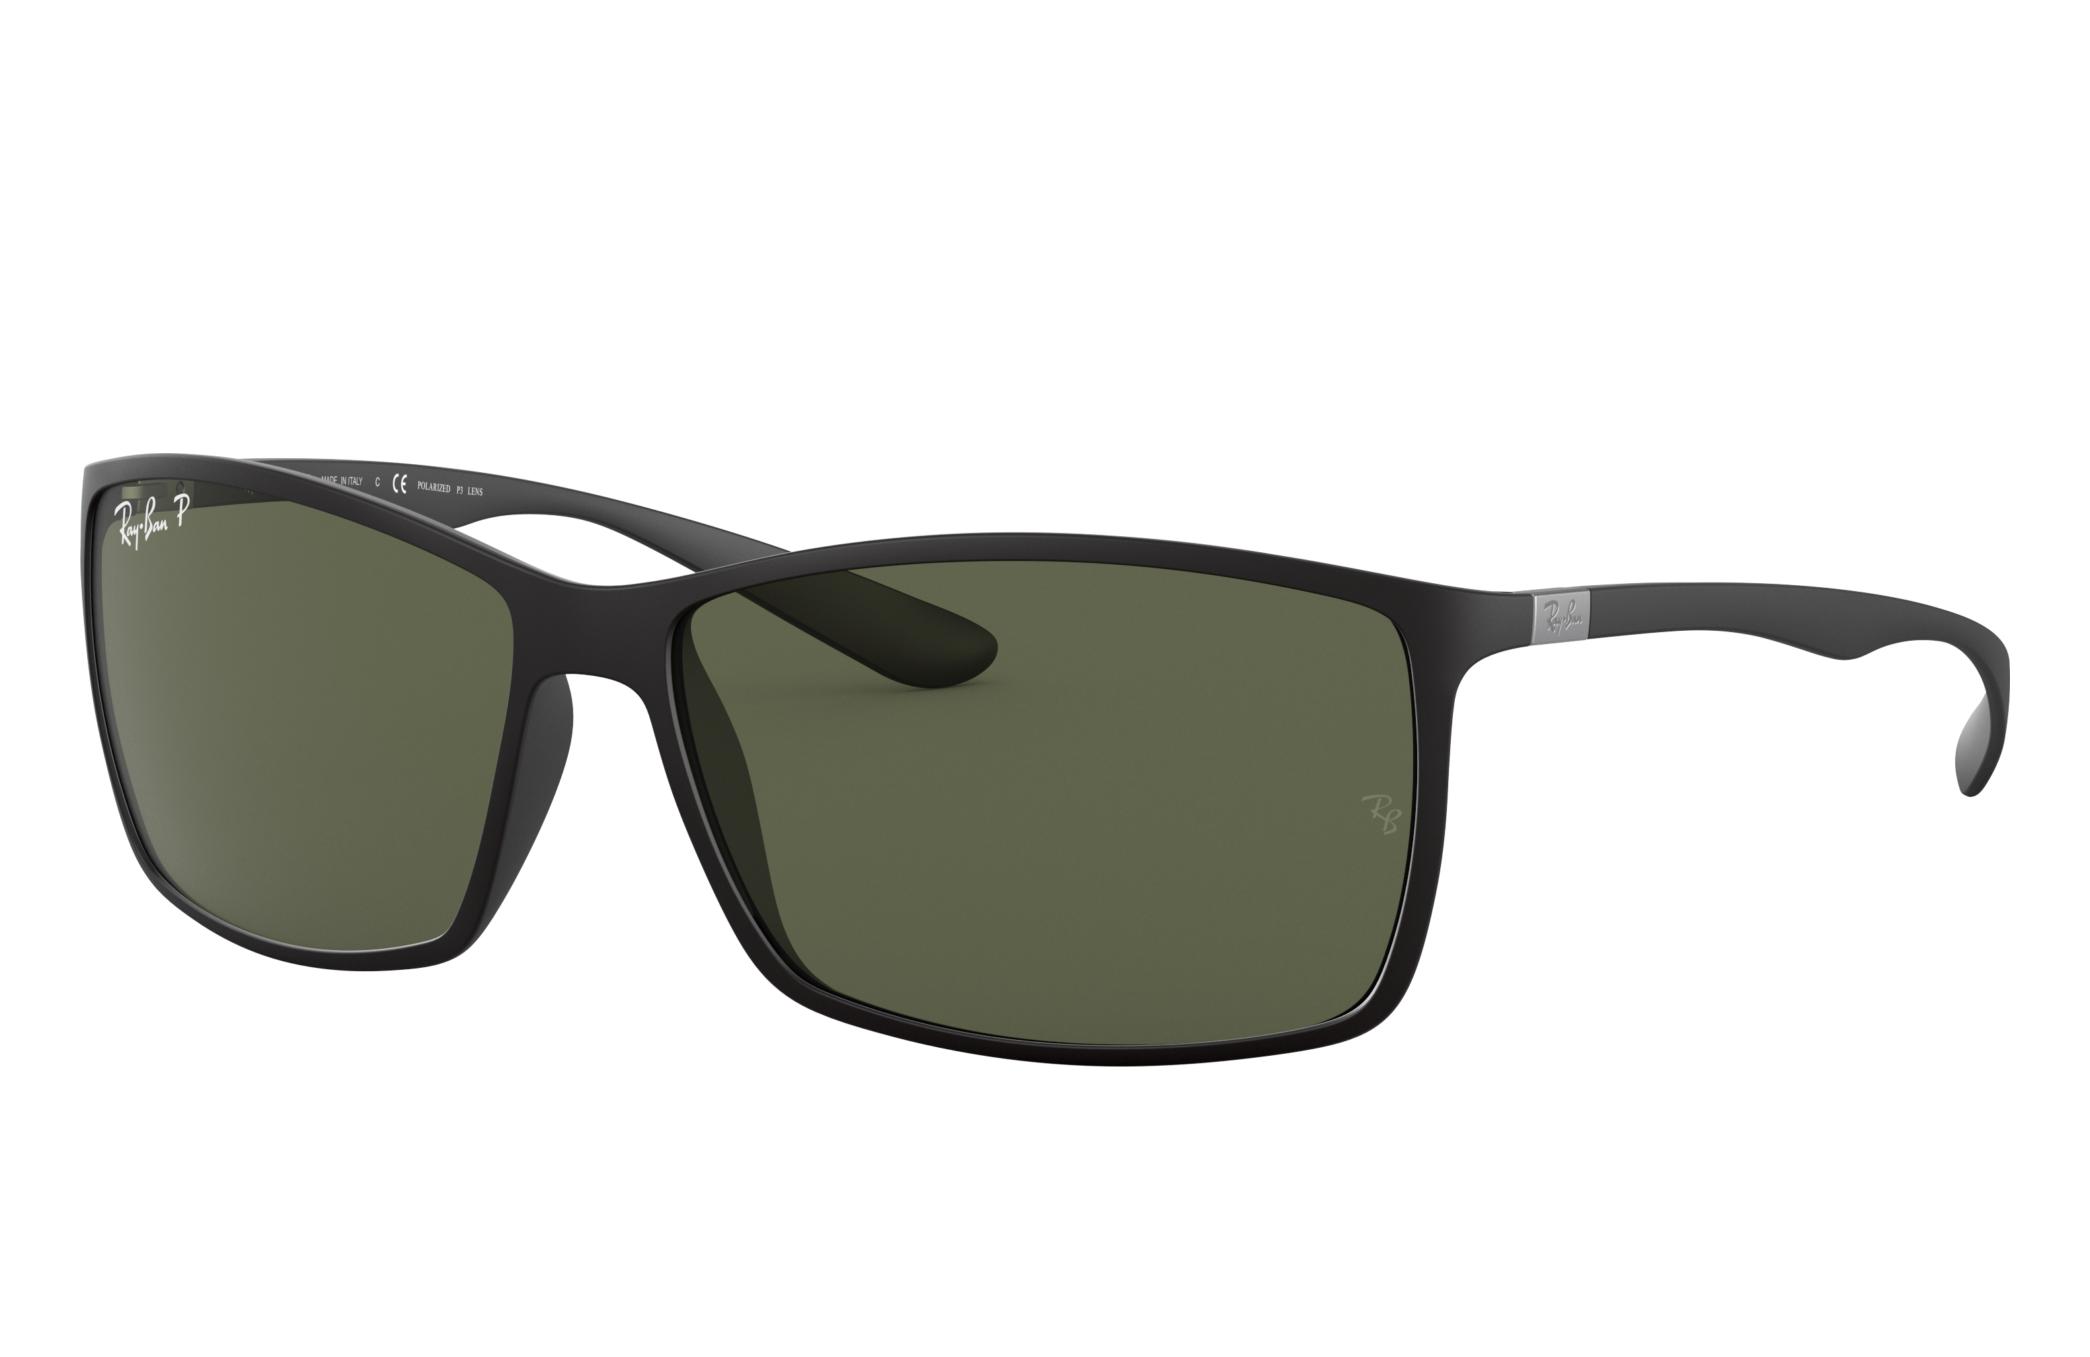 Ray-Ban Rb4179 Black, Polarized Green Lenses - RB4179